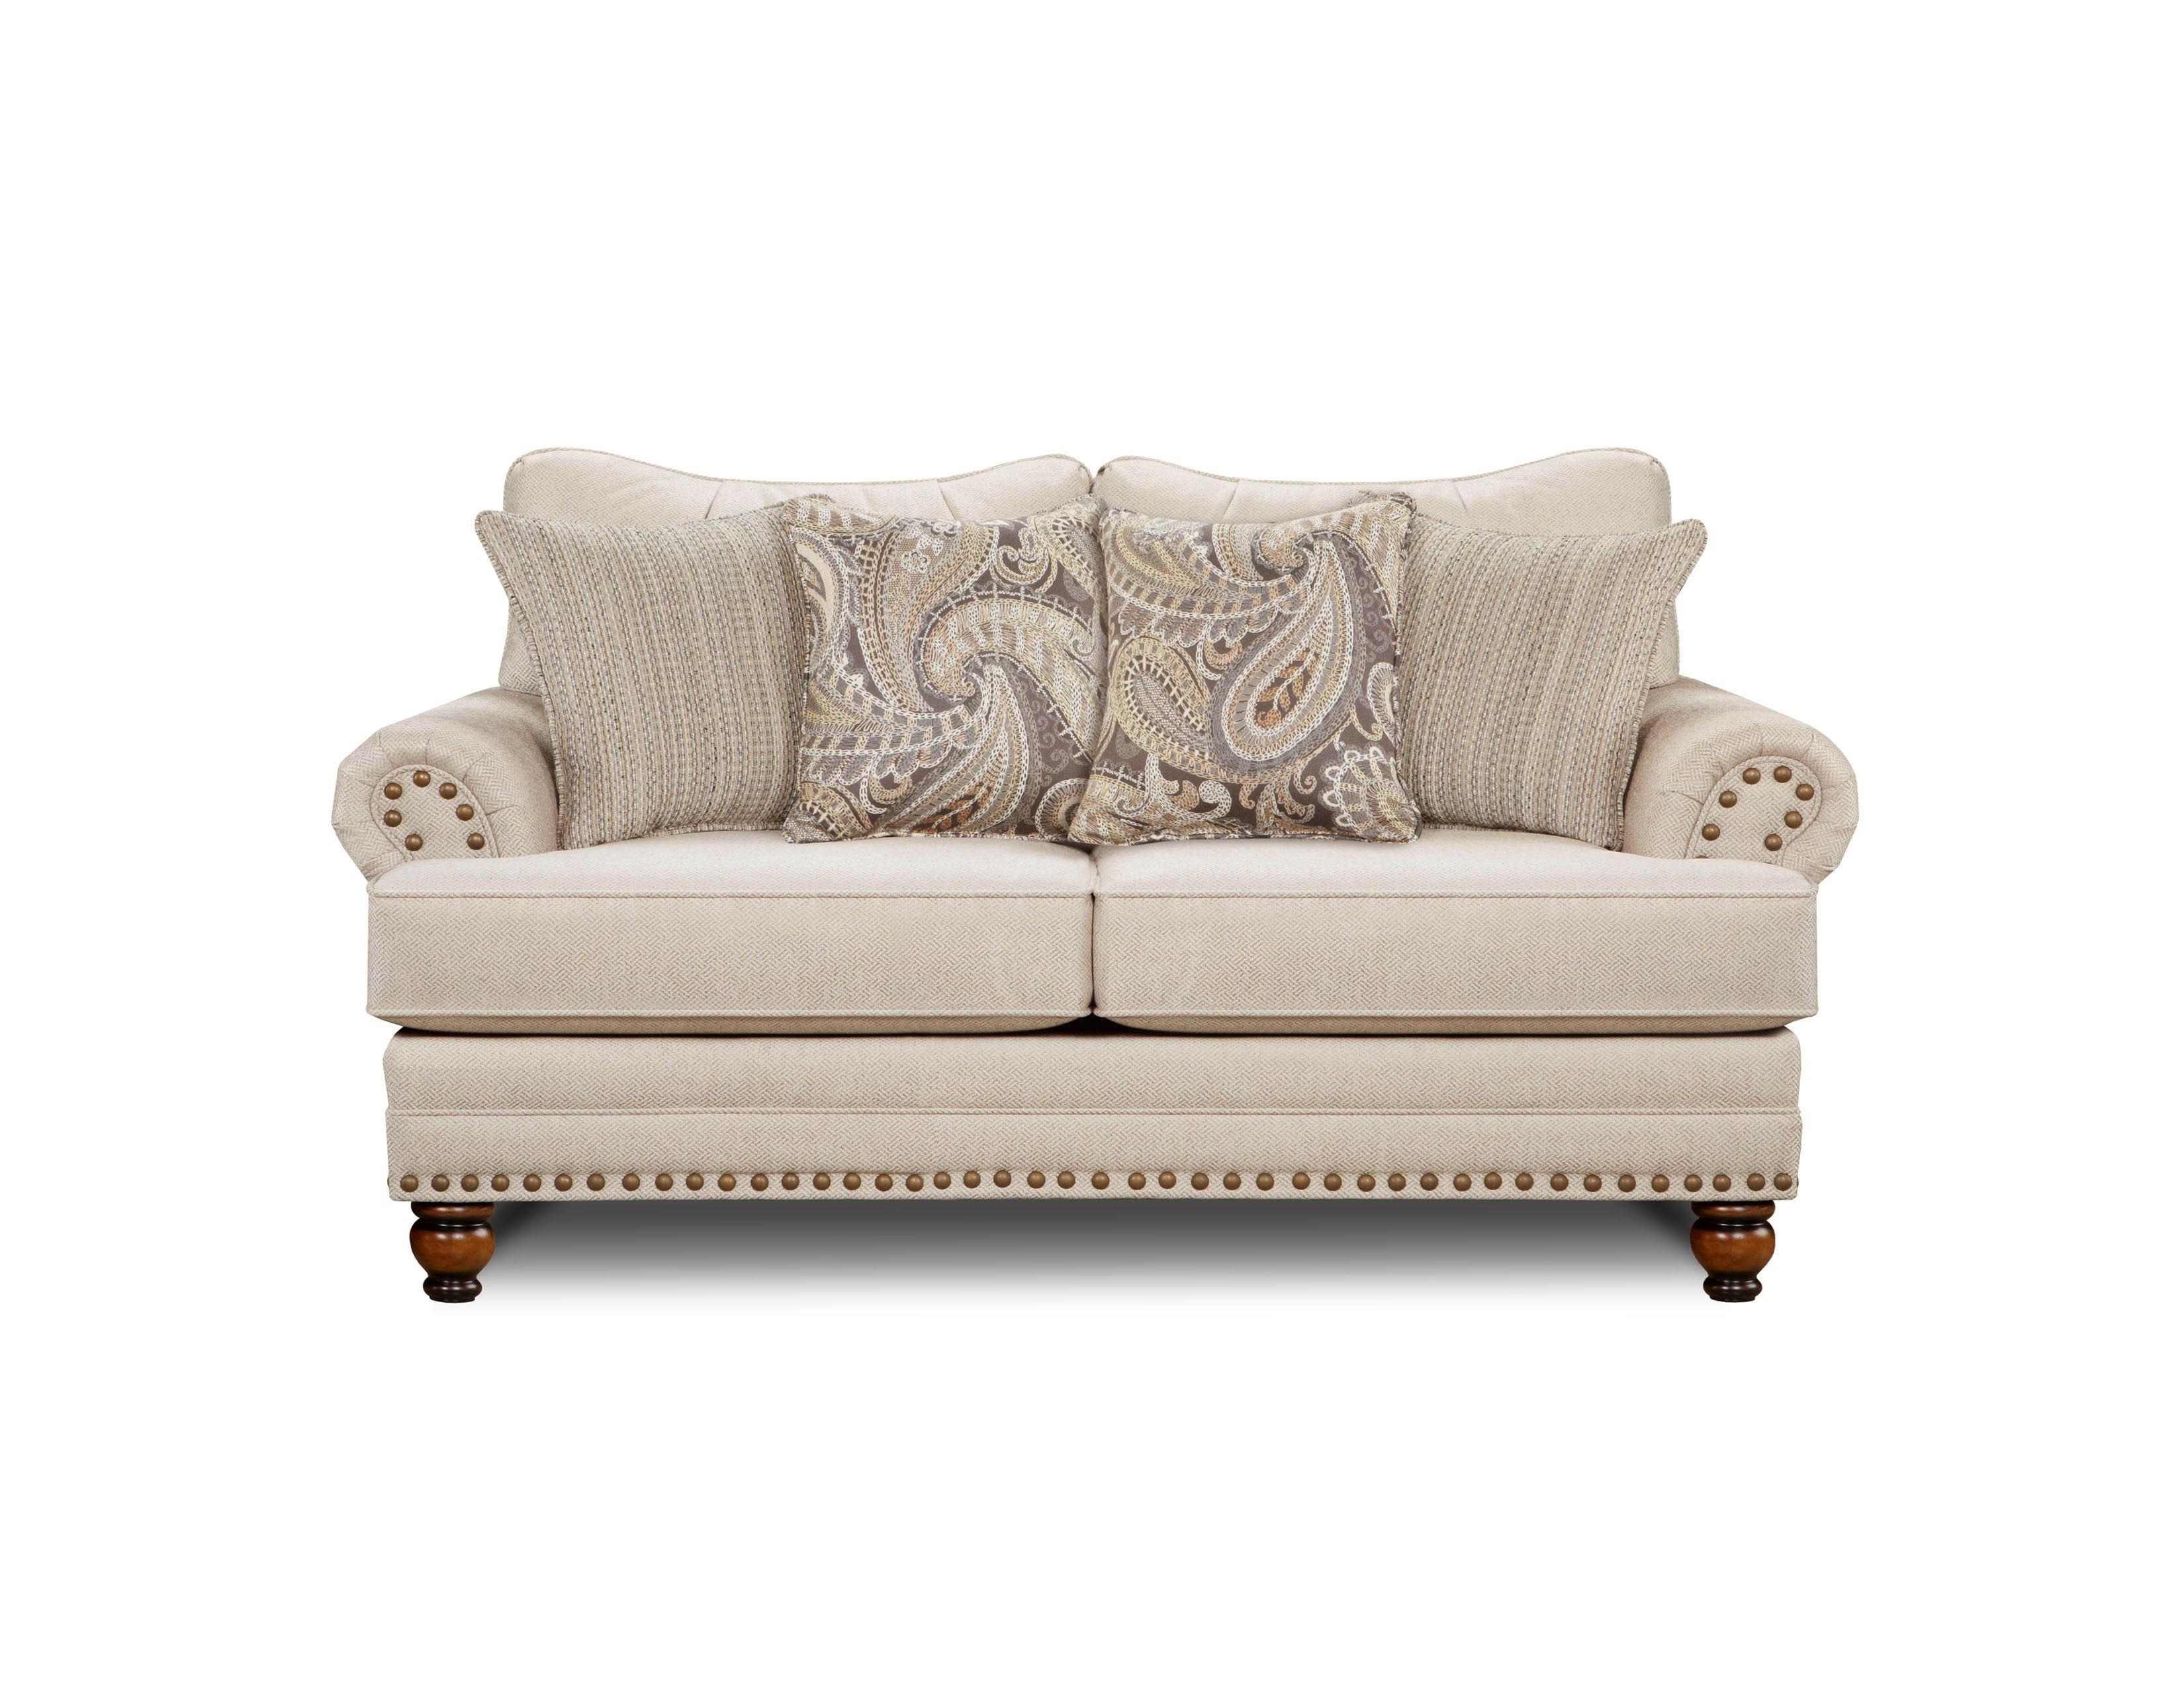 Carys Doe Fusion Furniture loveseat